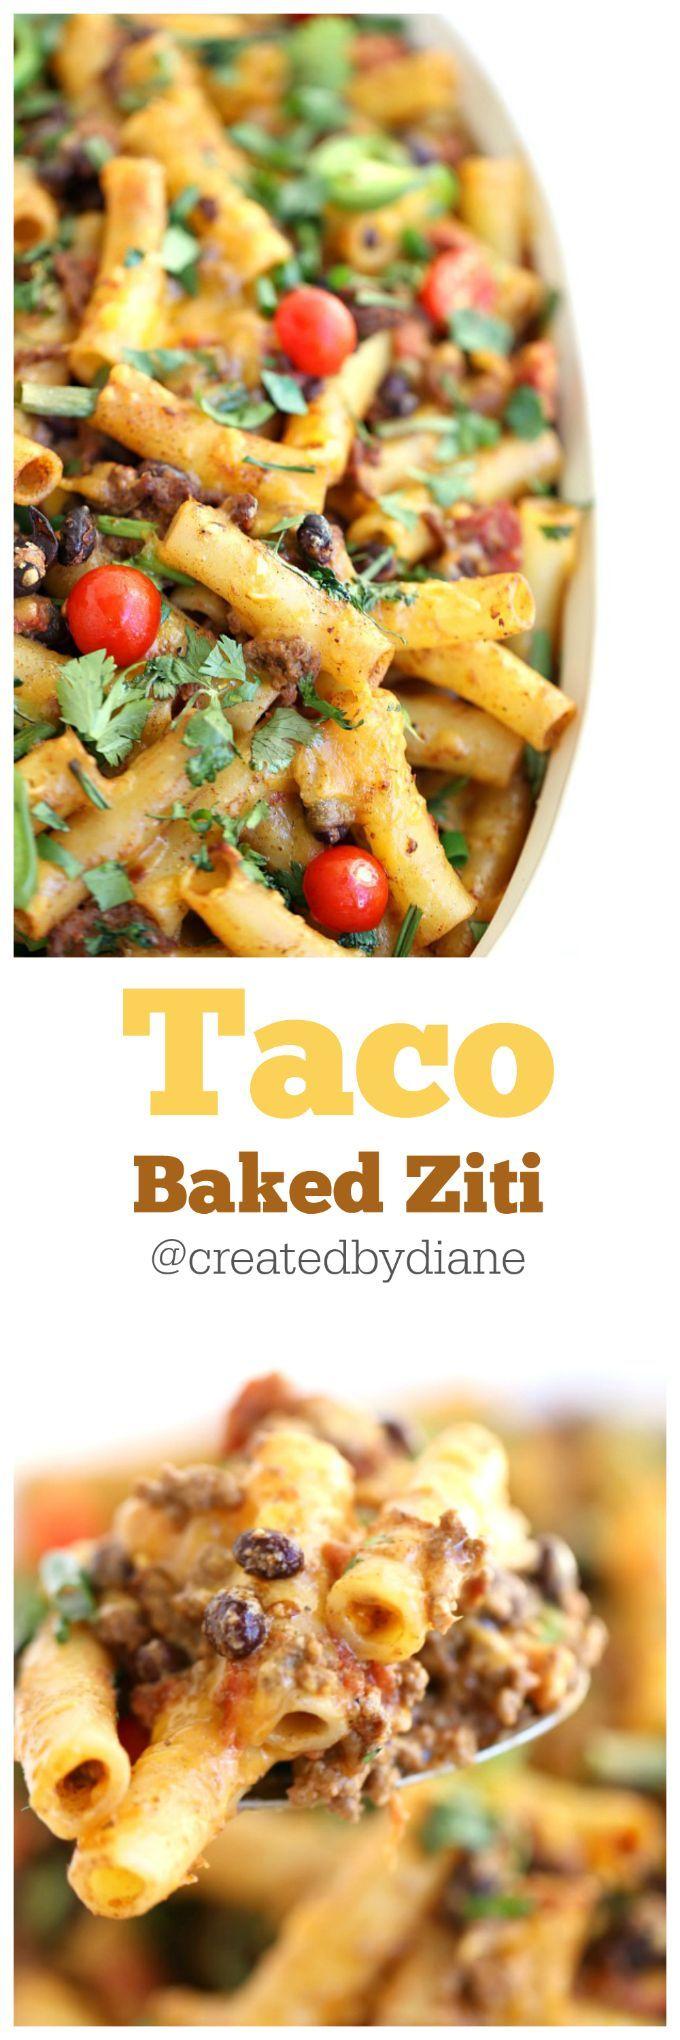 taco baked ziti http://www.createdby-diane.com